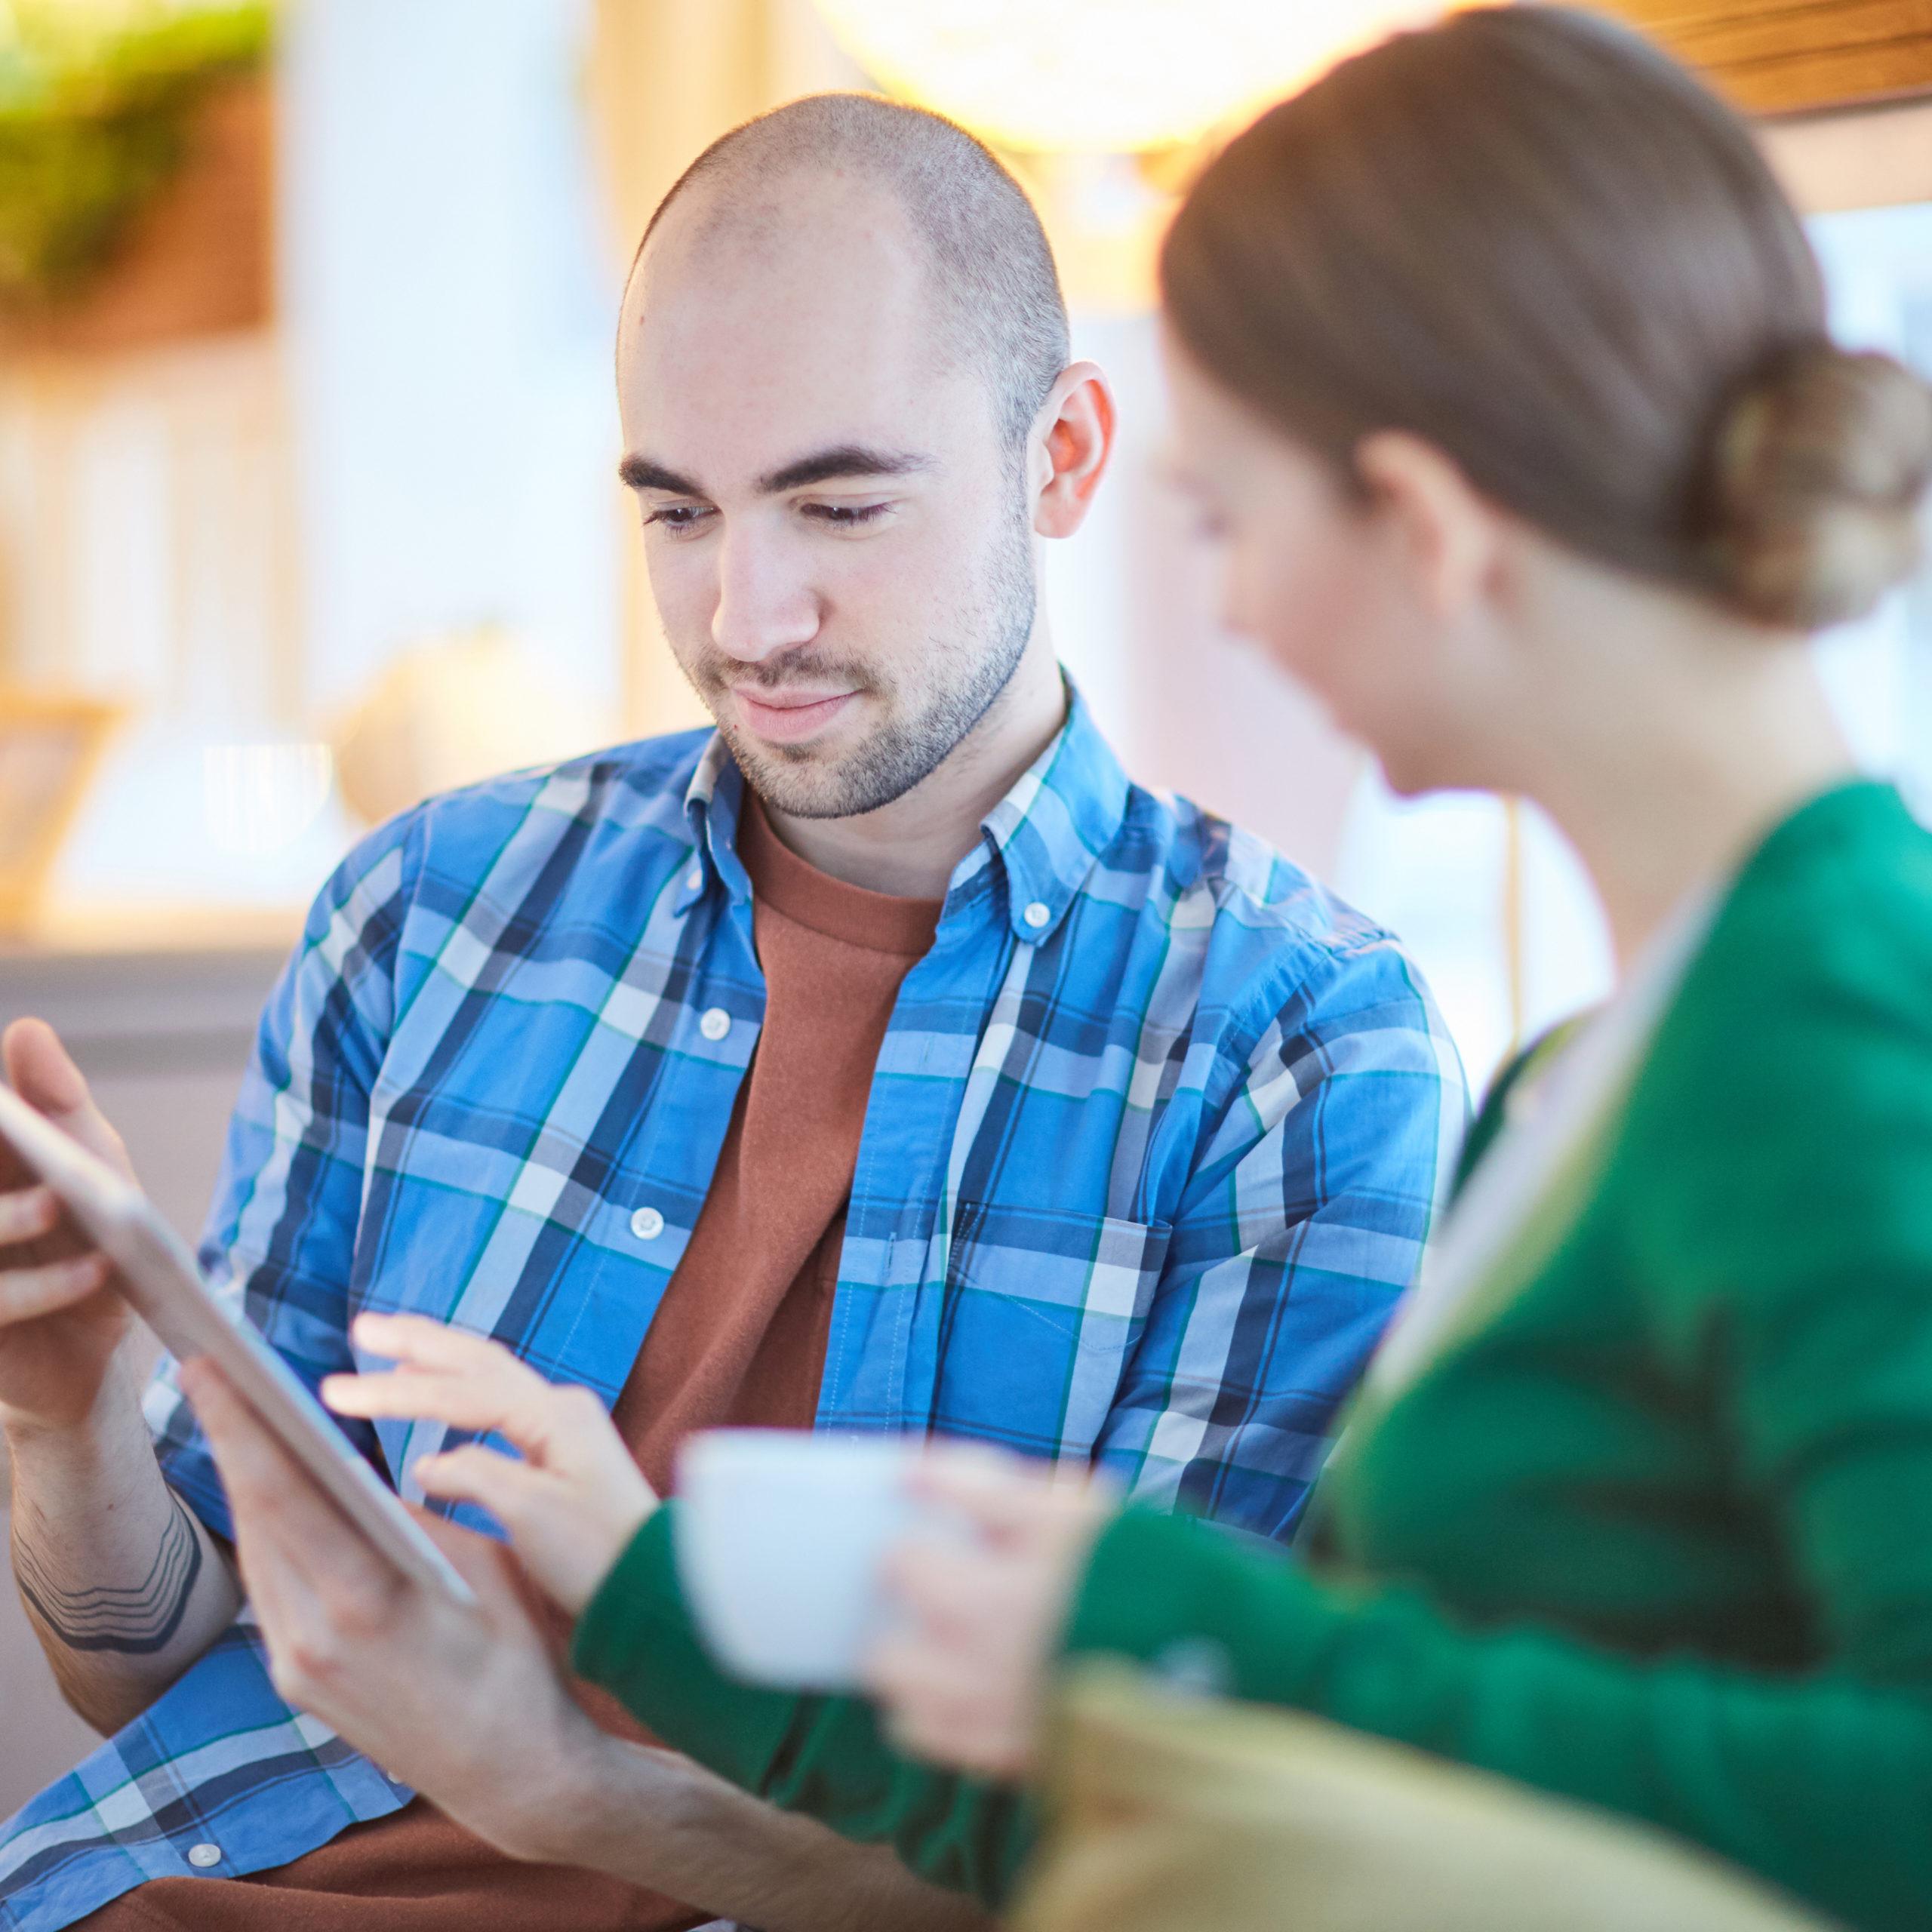 Best parental control apps for safe internet browsing scaled